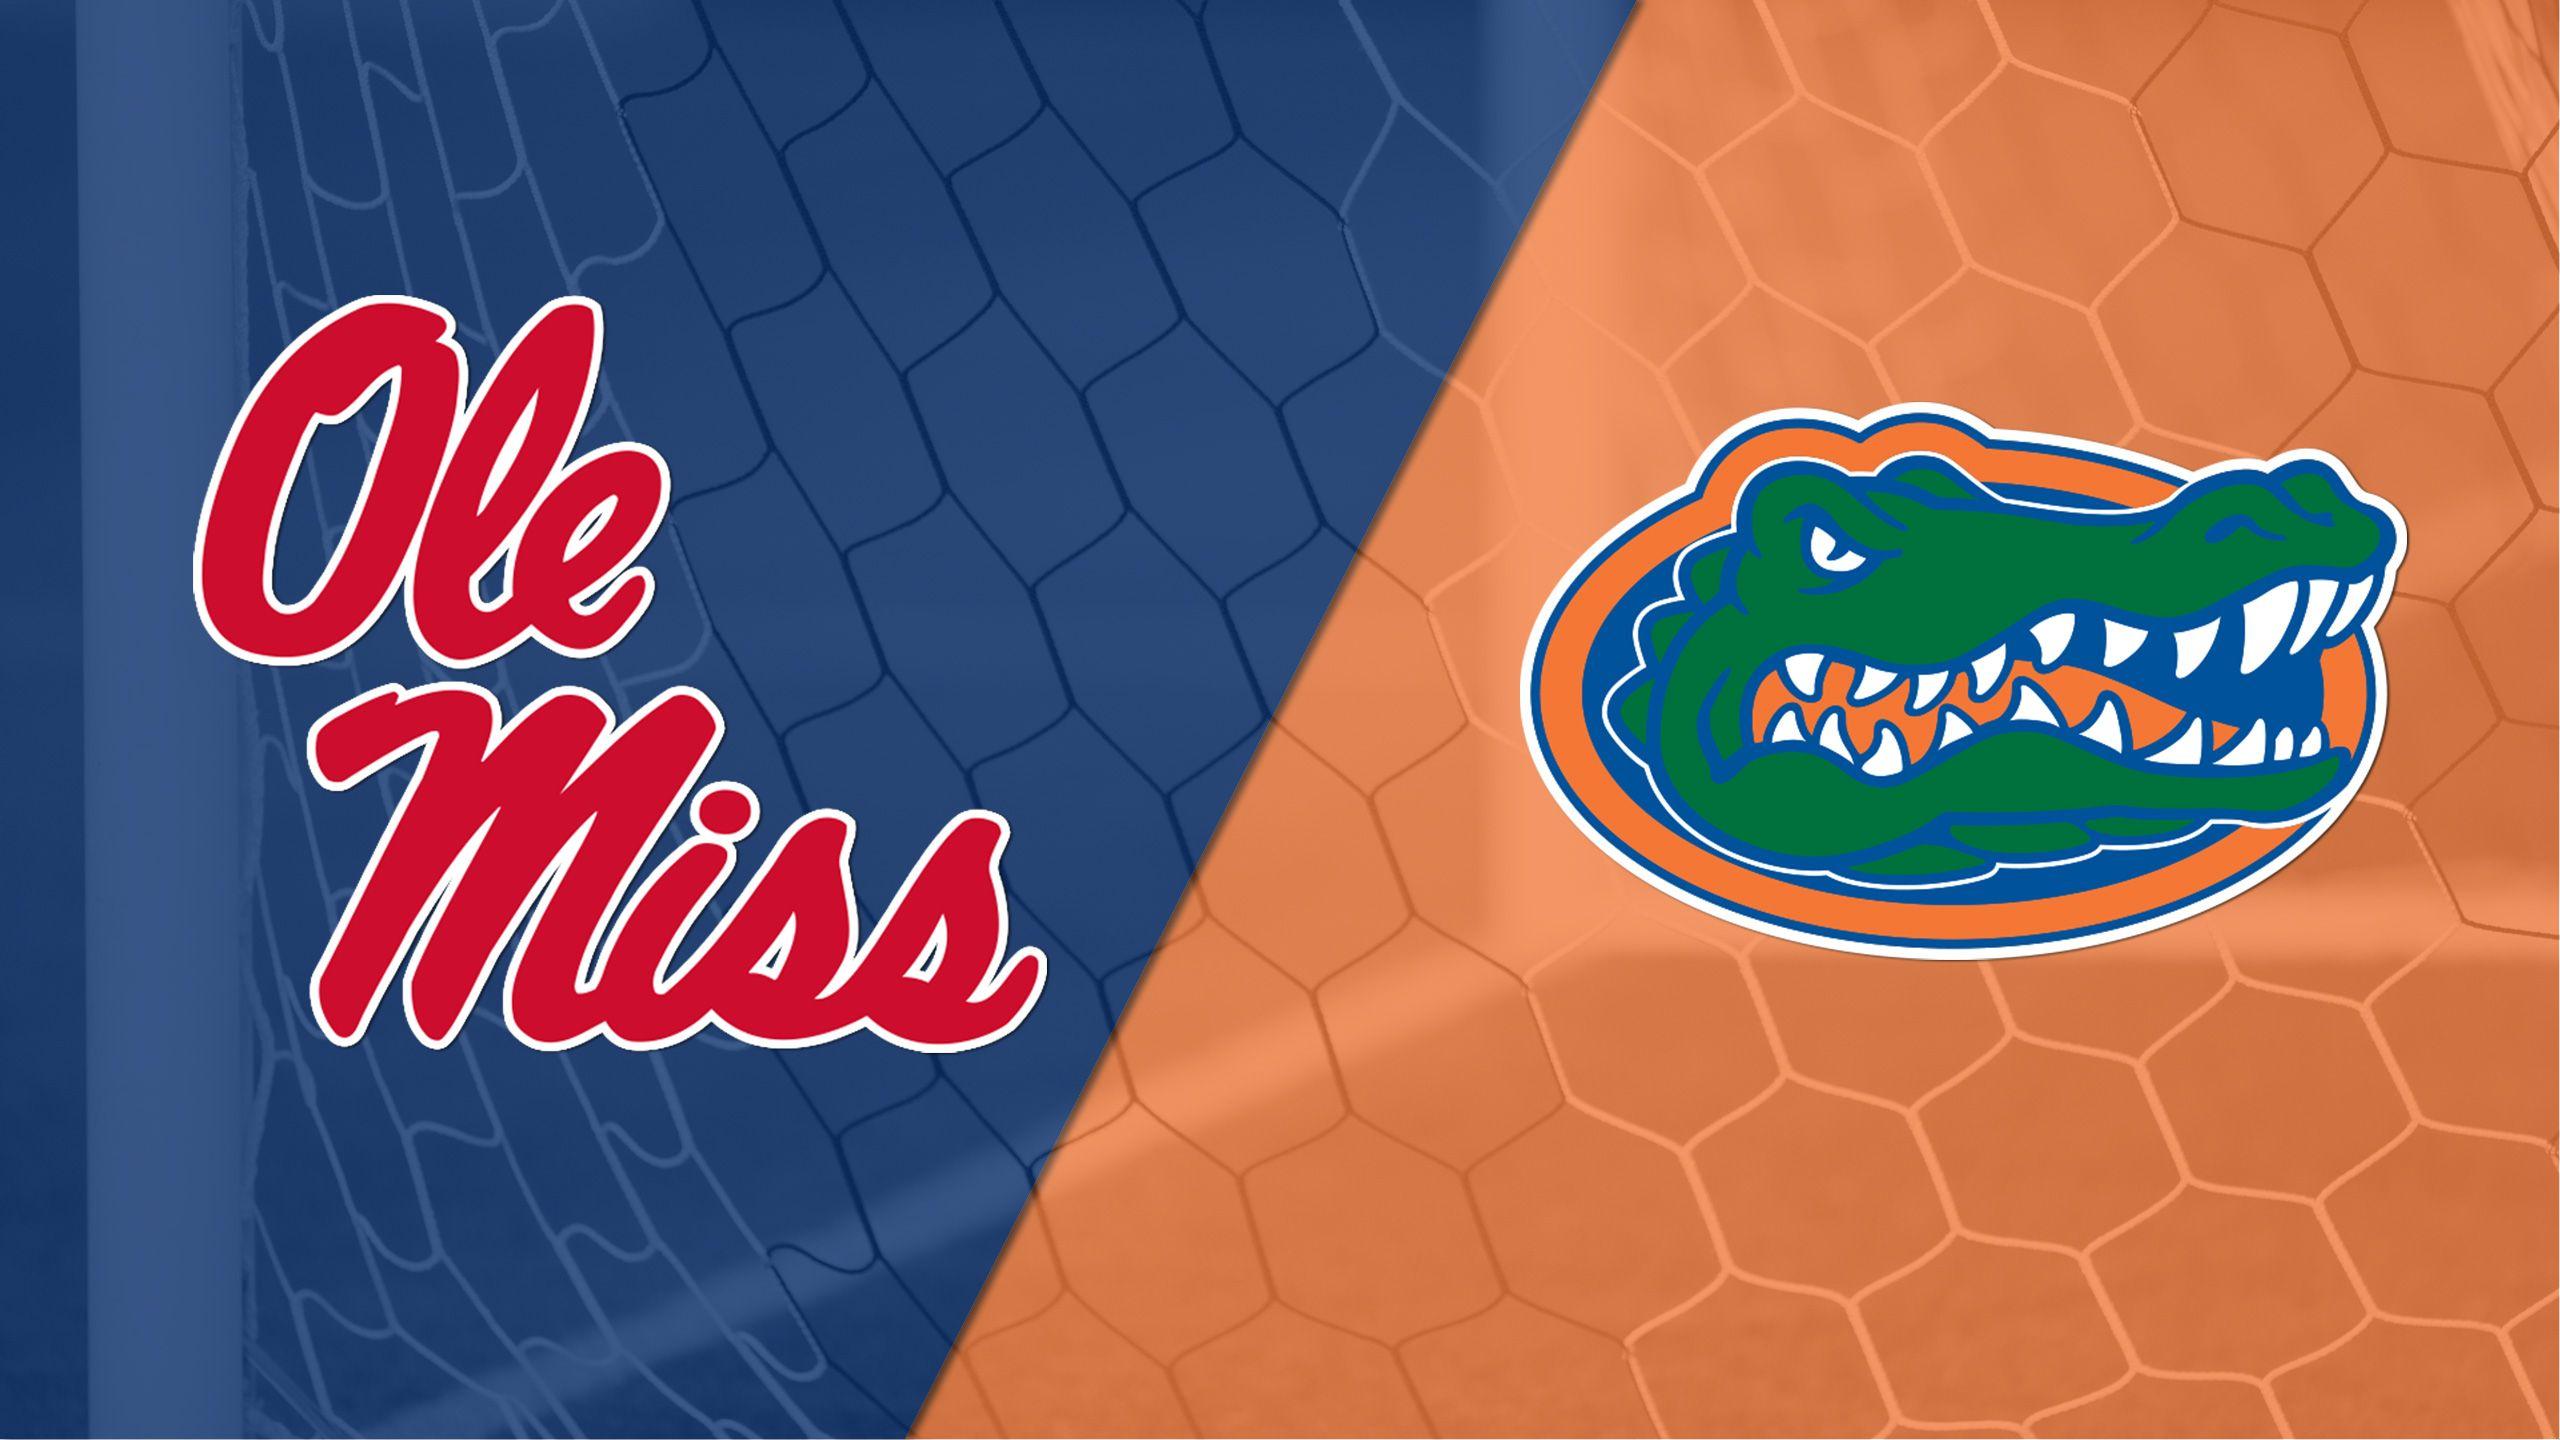 #24 Ole Miss vs. #7 Florida (W Soccer)